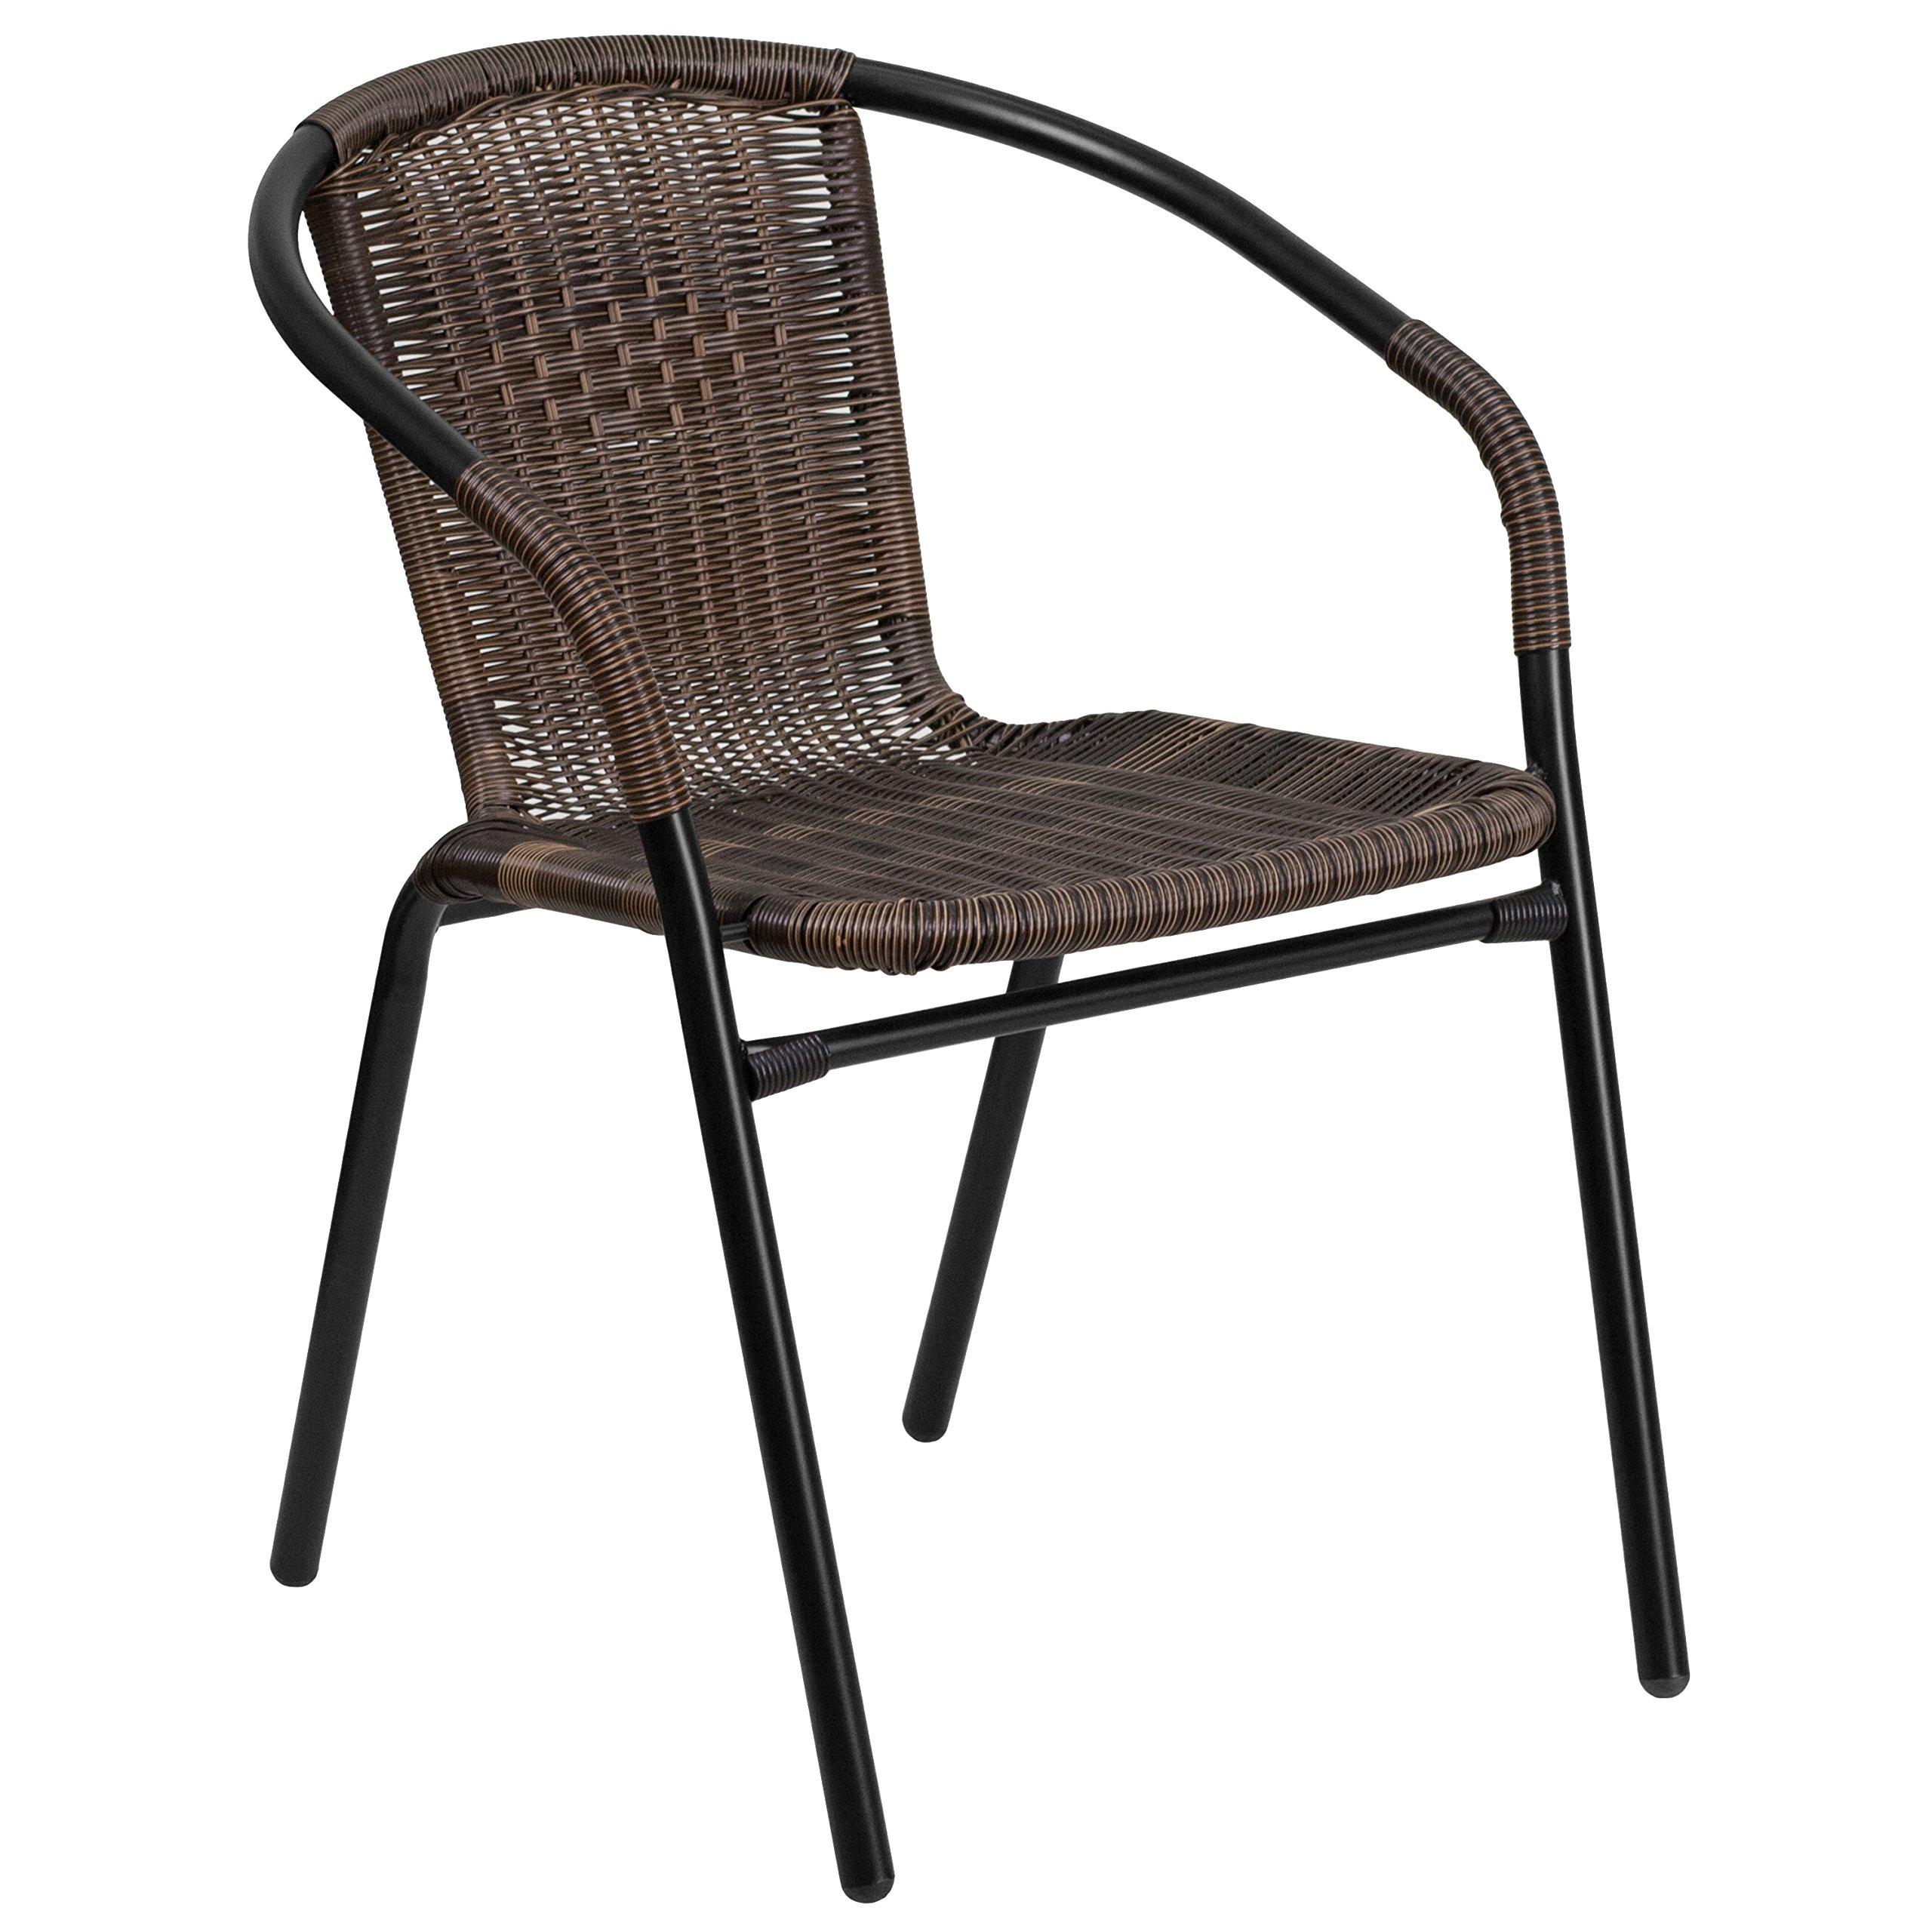 Flash Furniture Medium Brown Rattan Indoor-Outdoor Restaurant Stack Chair by Flash Furniture